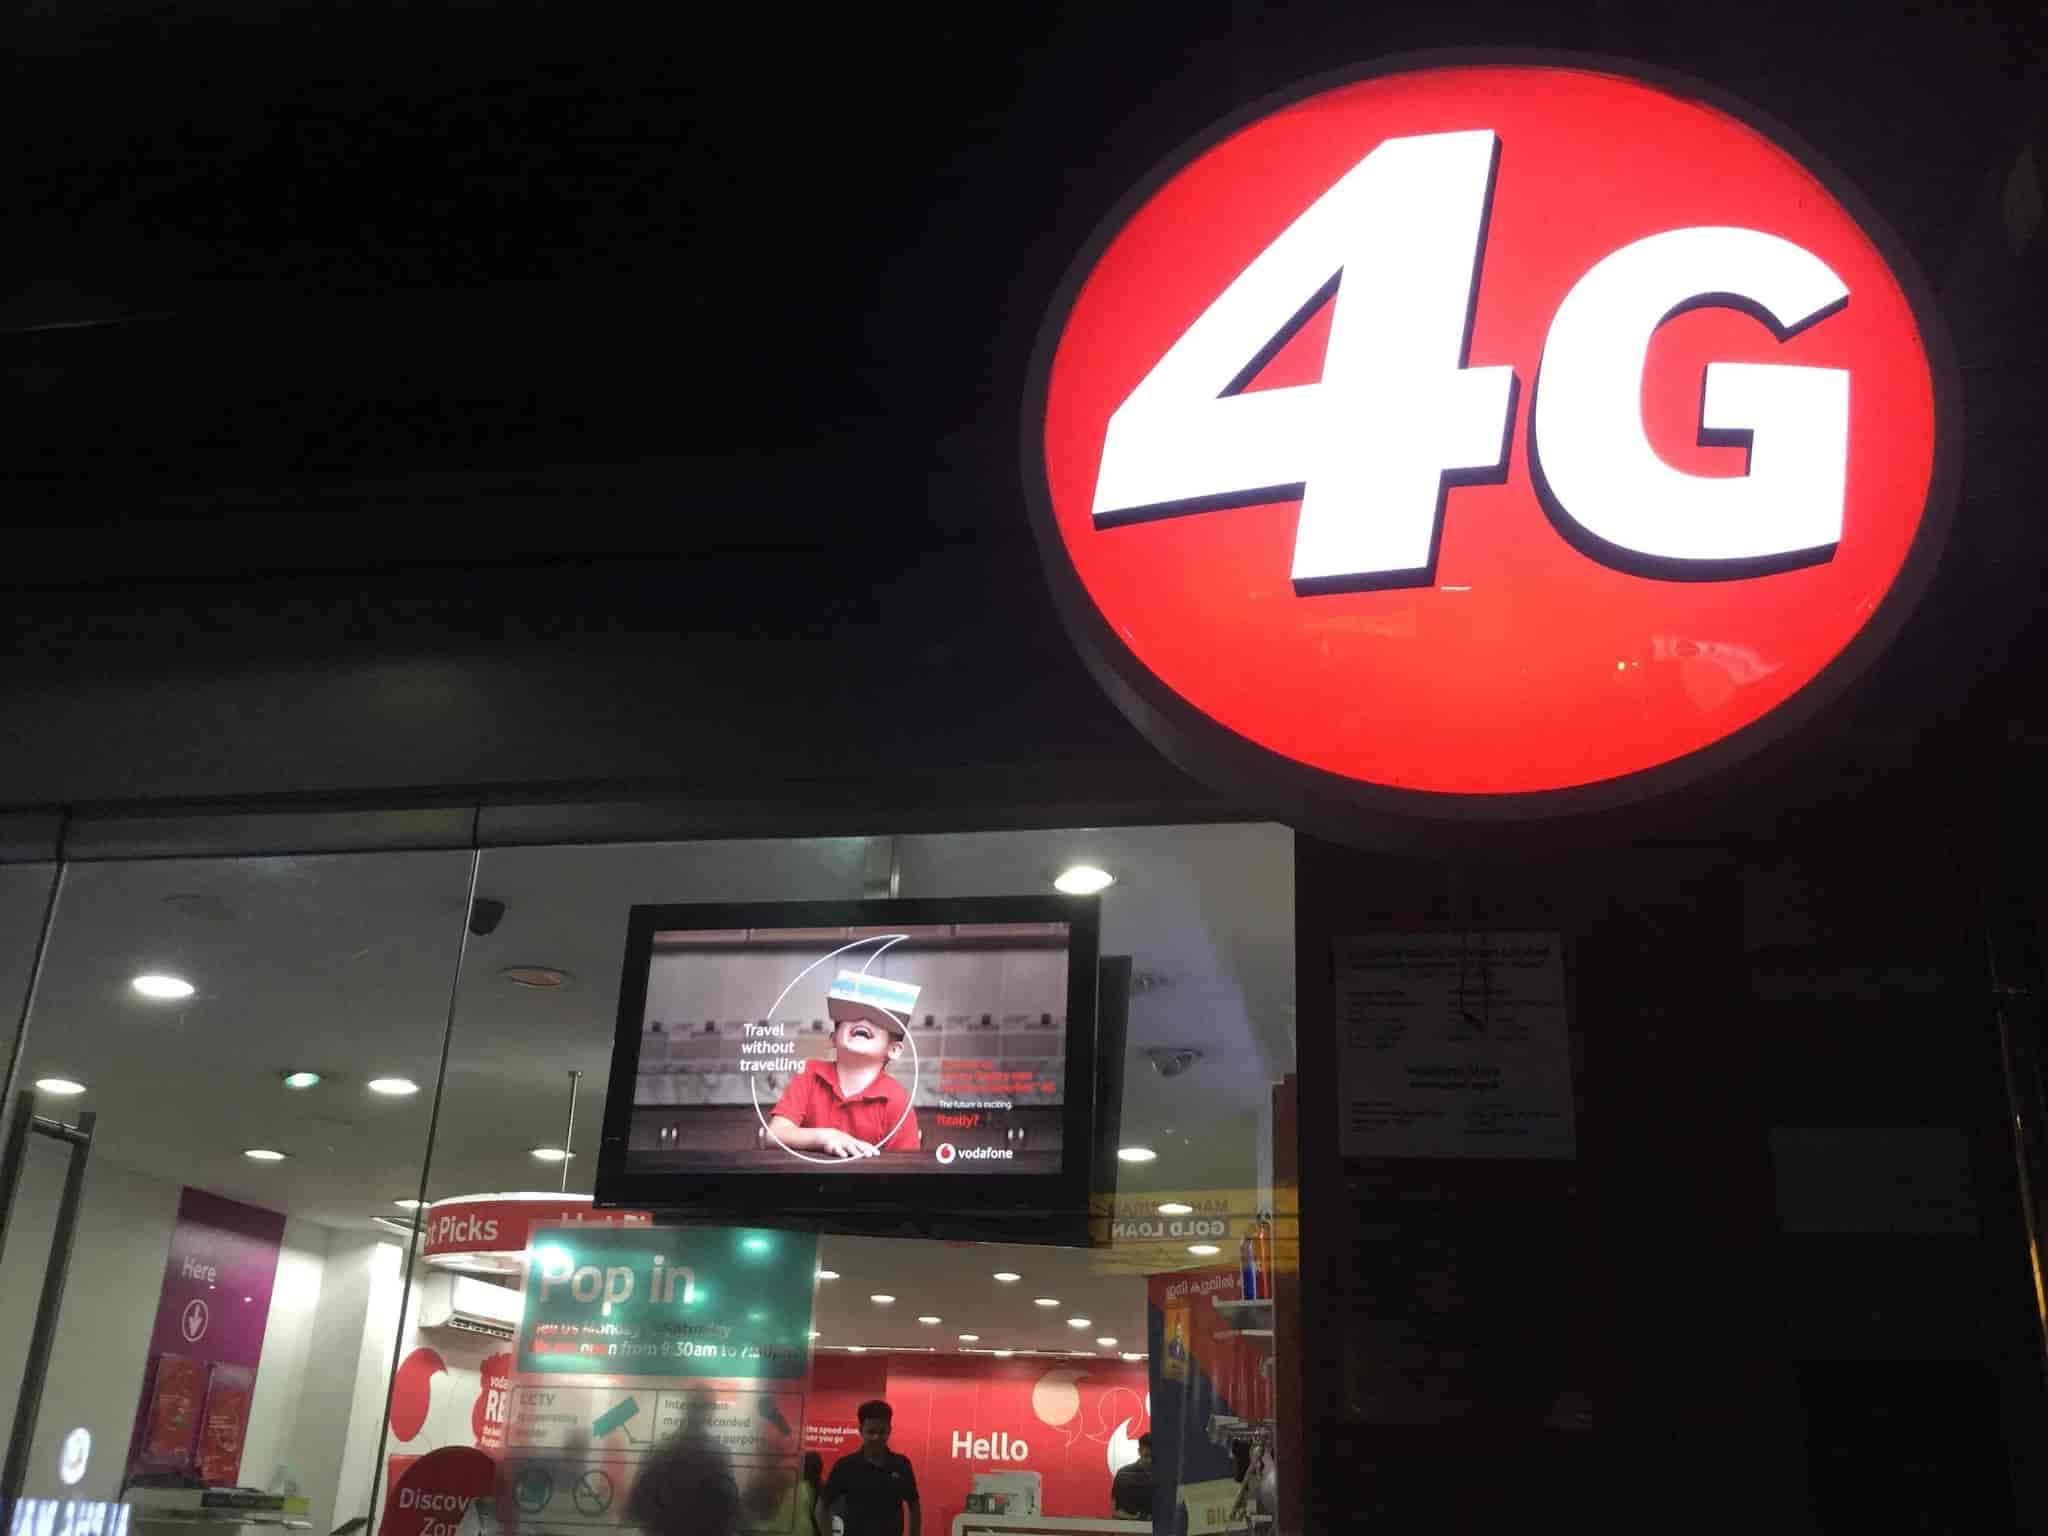 Vodafone Store, Mananchira - Broadband Internet Service Providers in